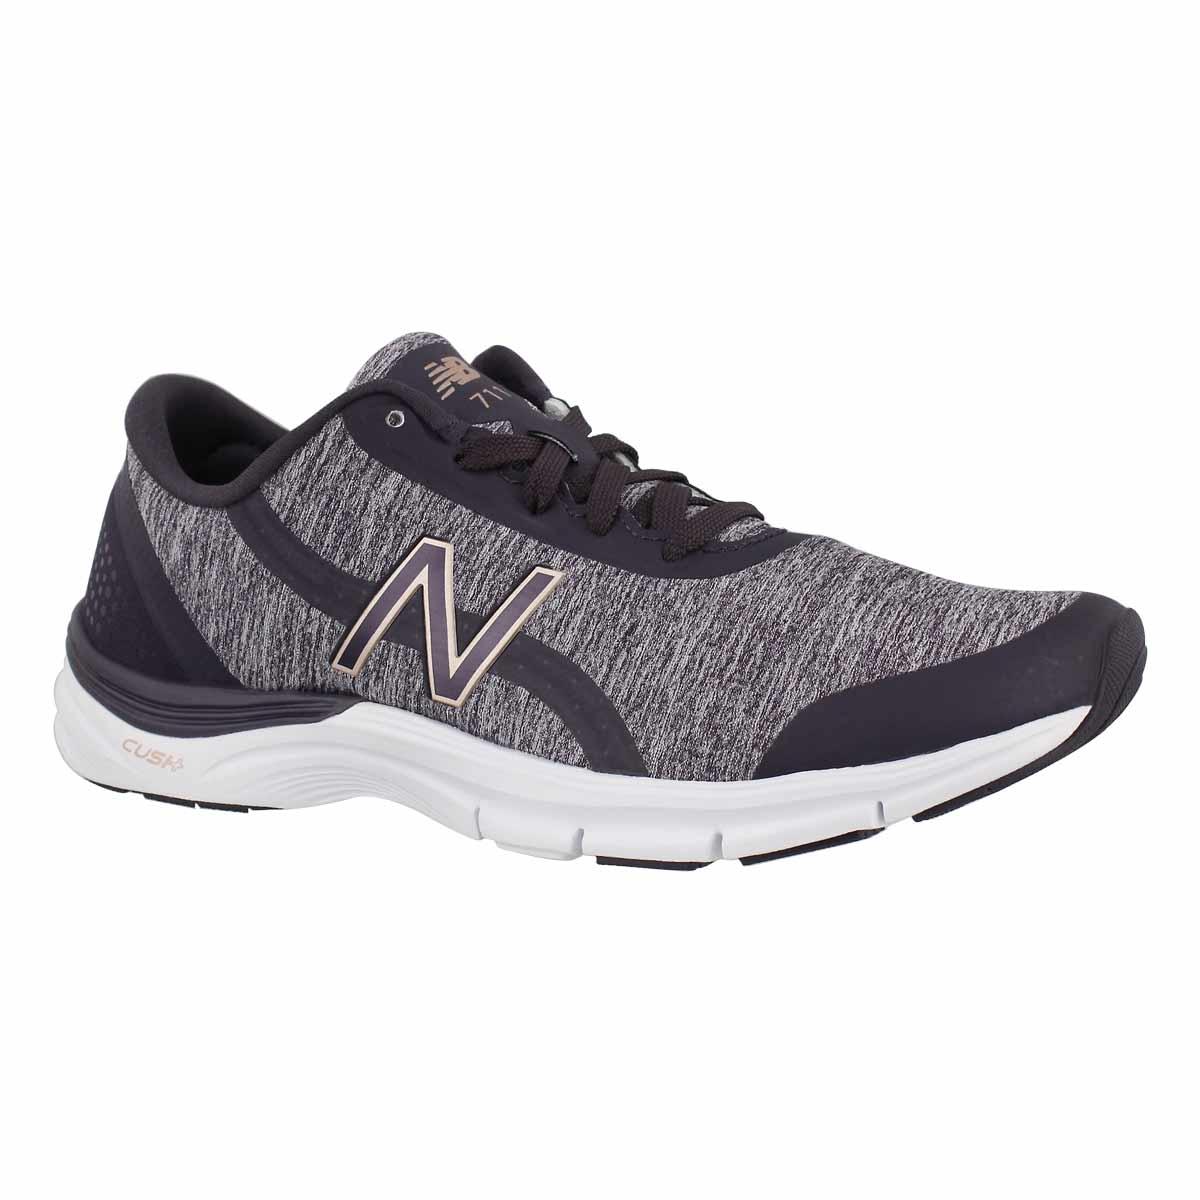 Women's 711v3 eldrbrry/thstl lace up sneakers